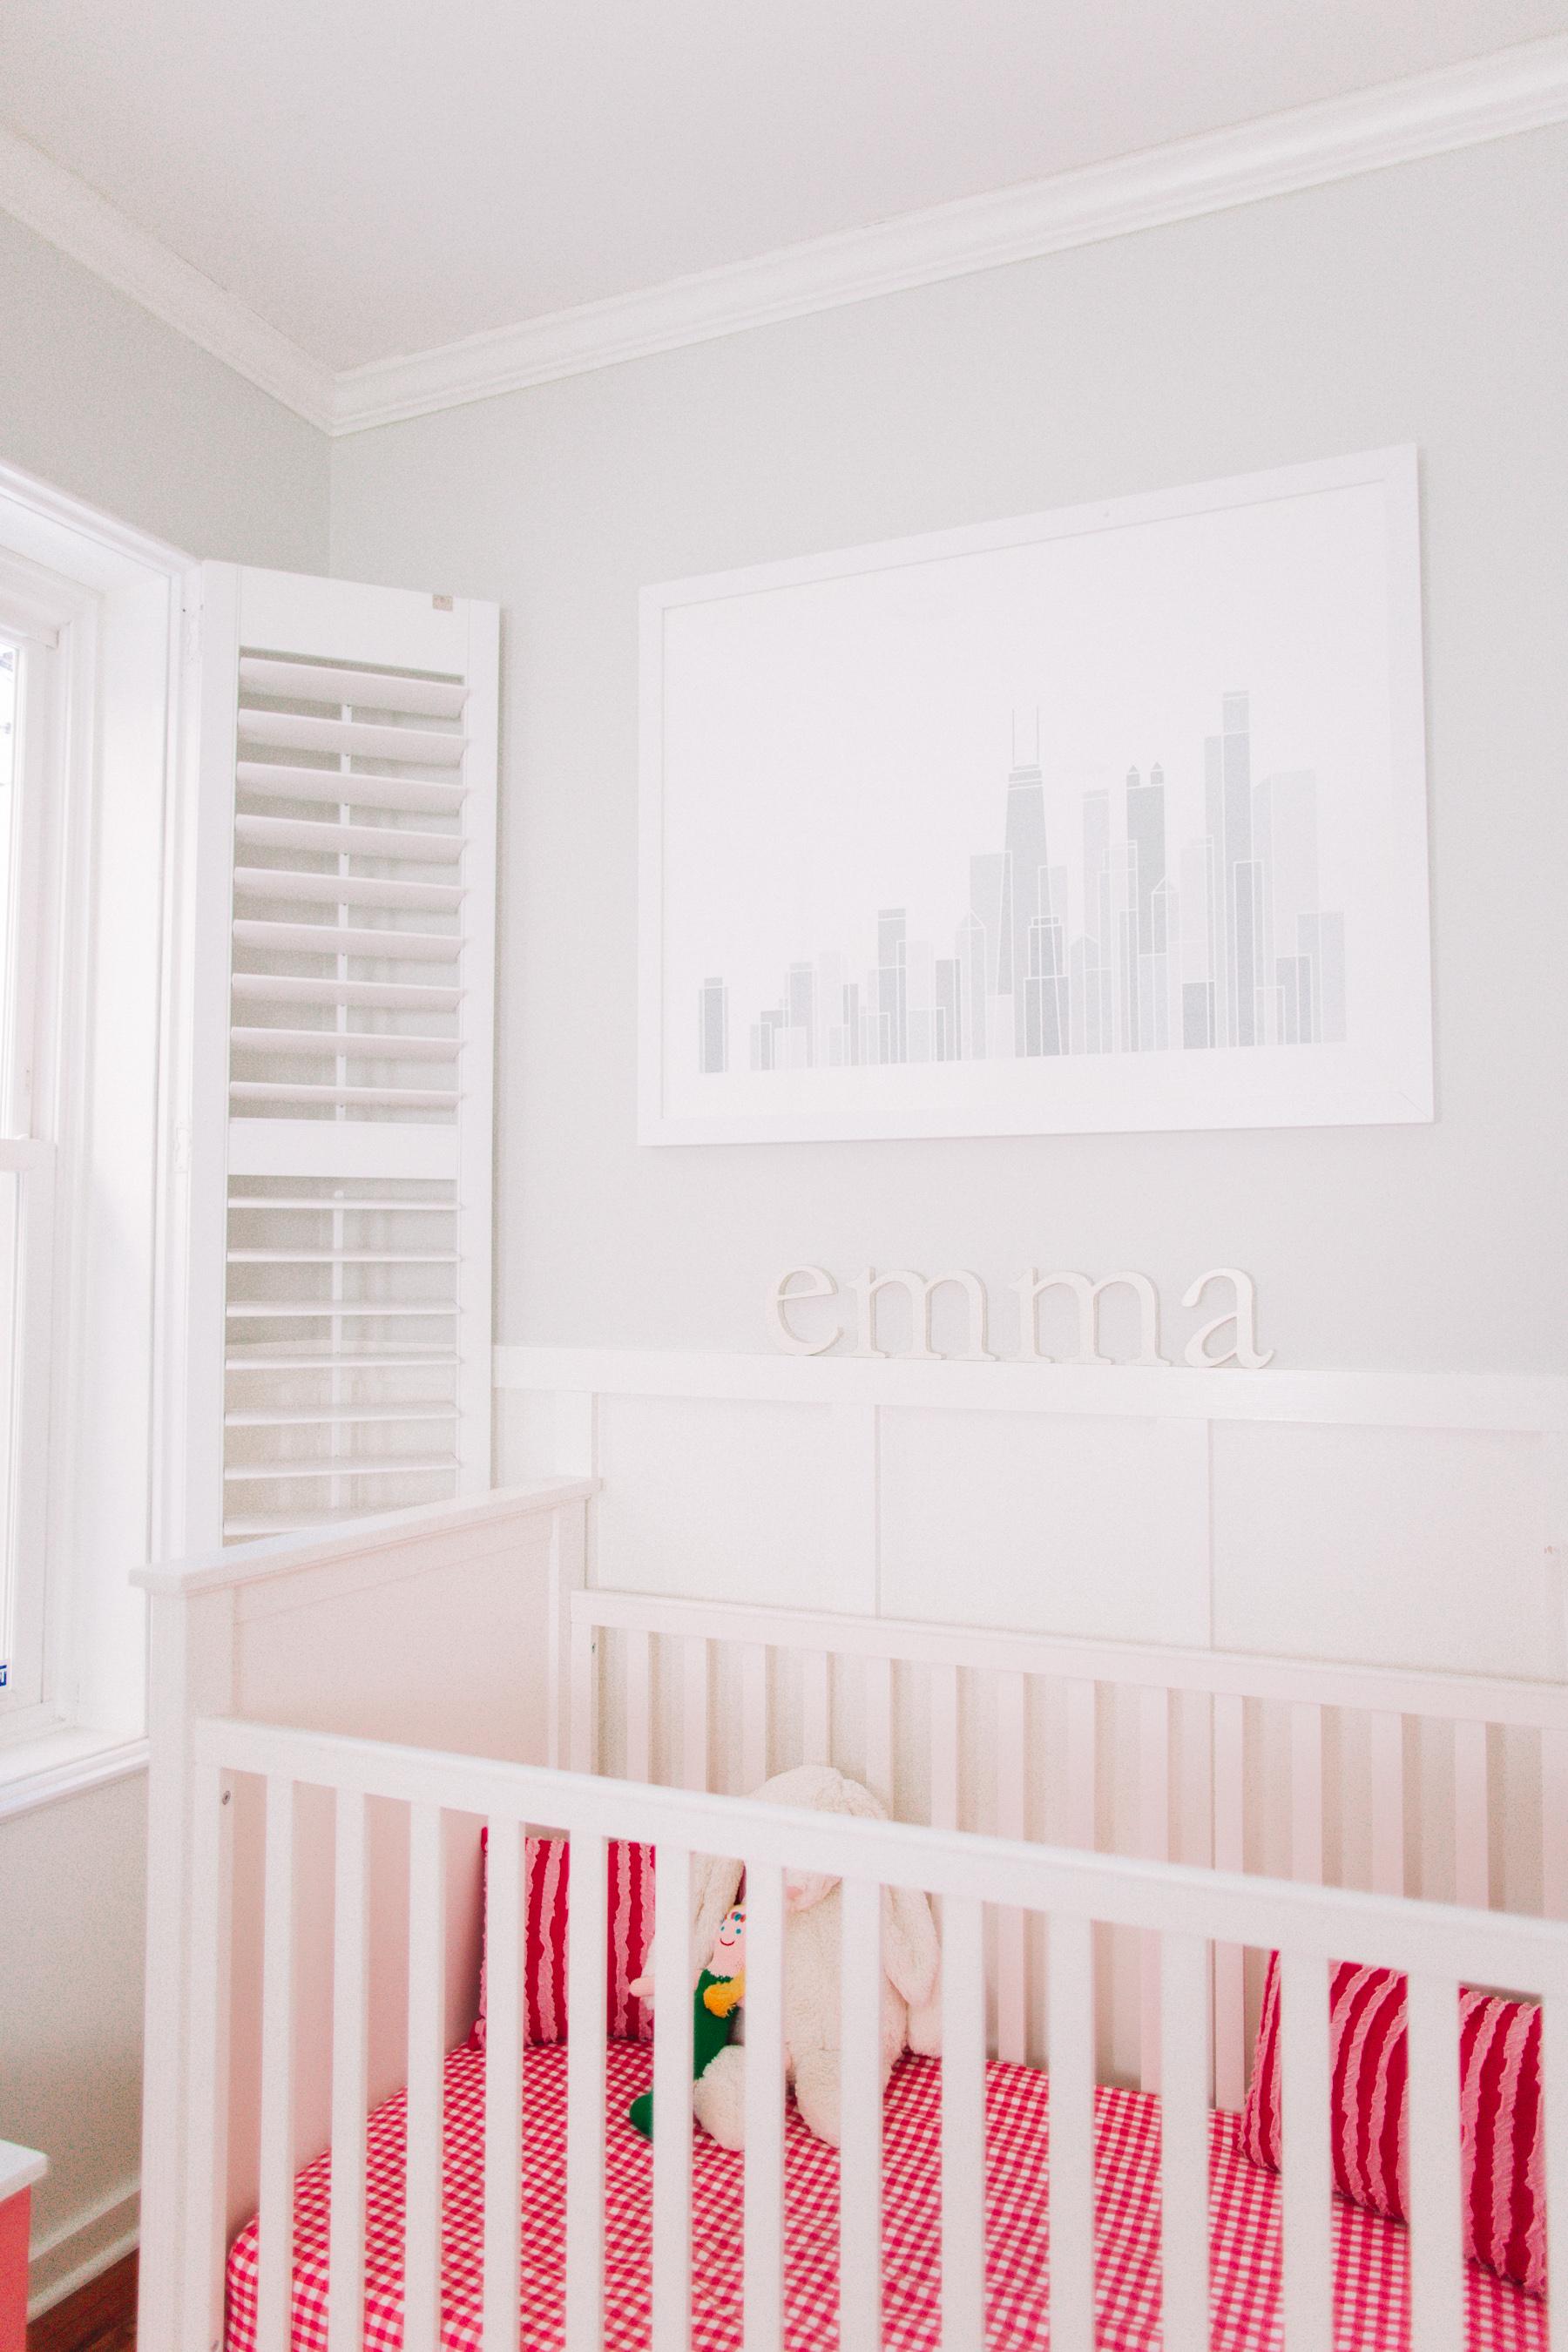 Emma Larkin's room